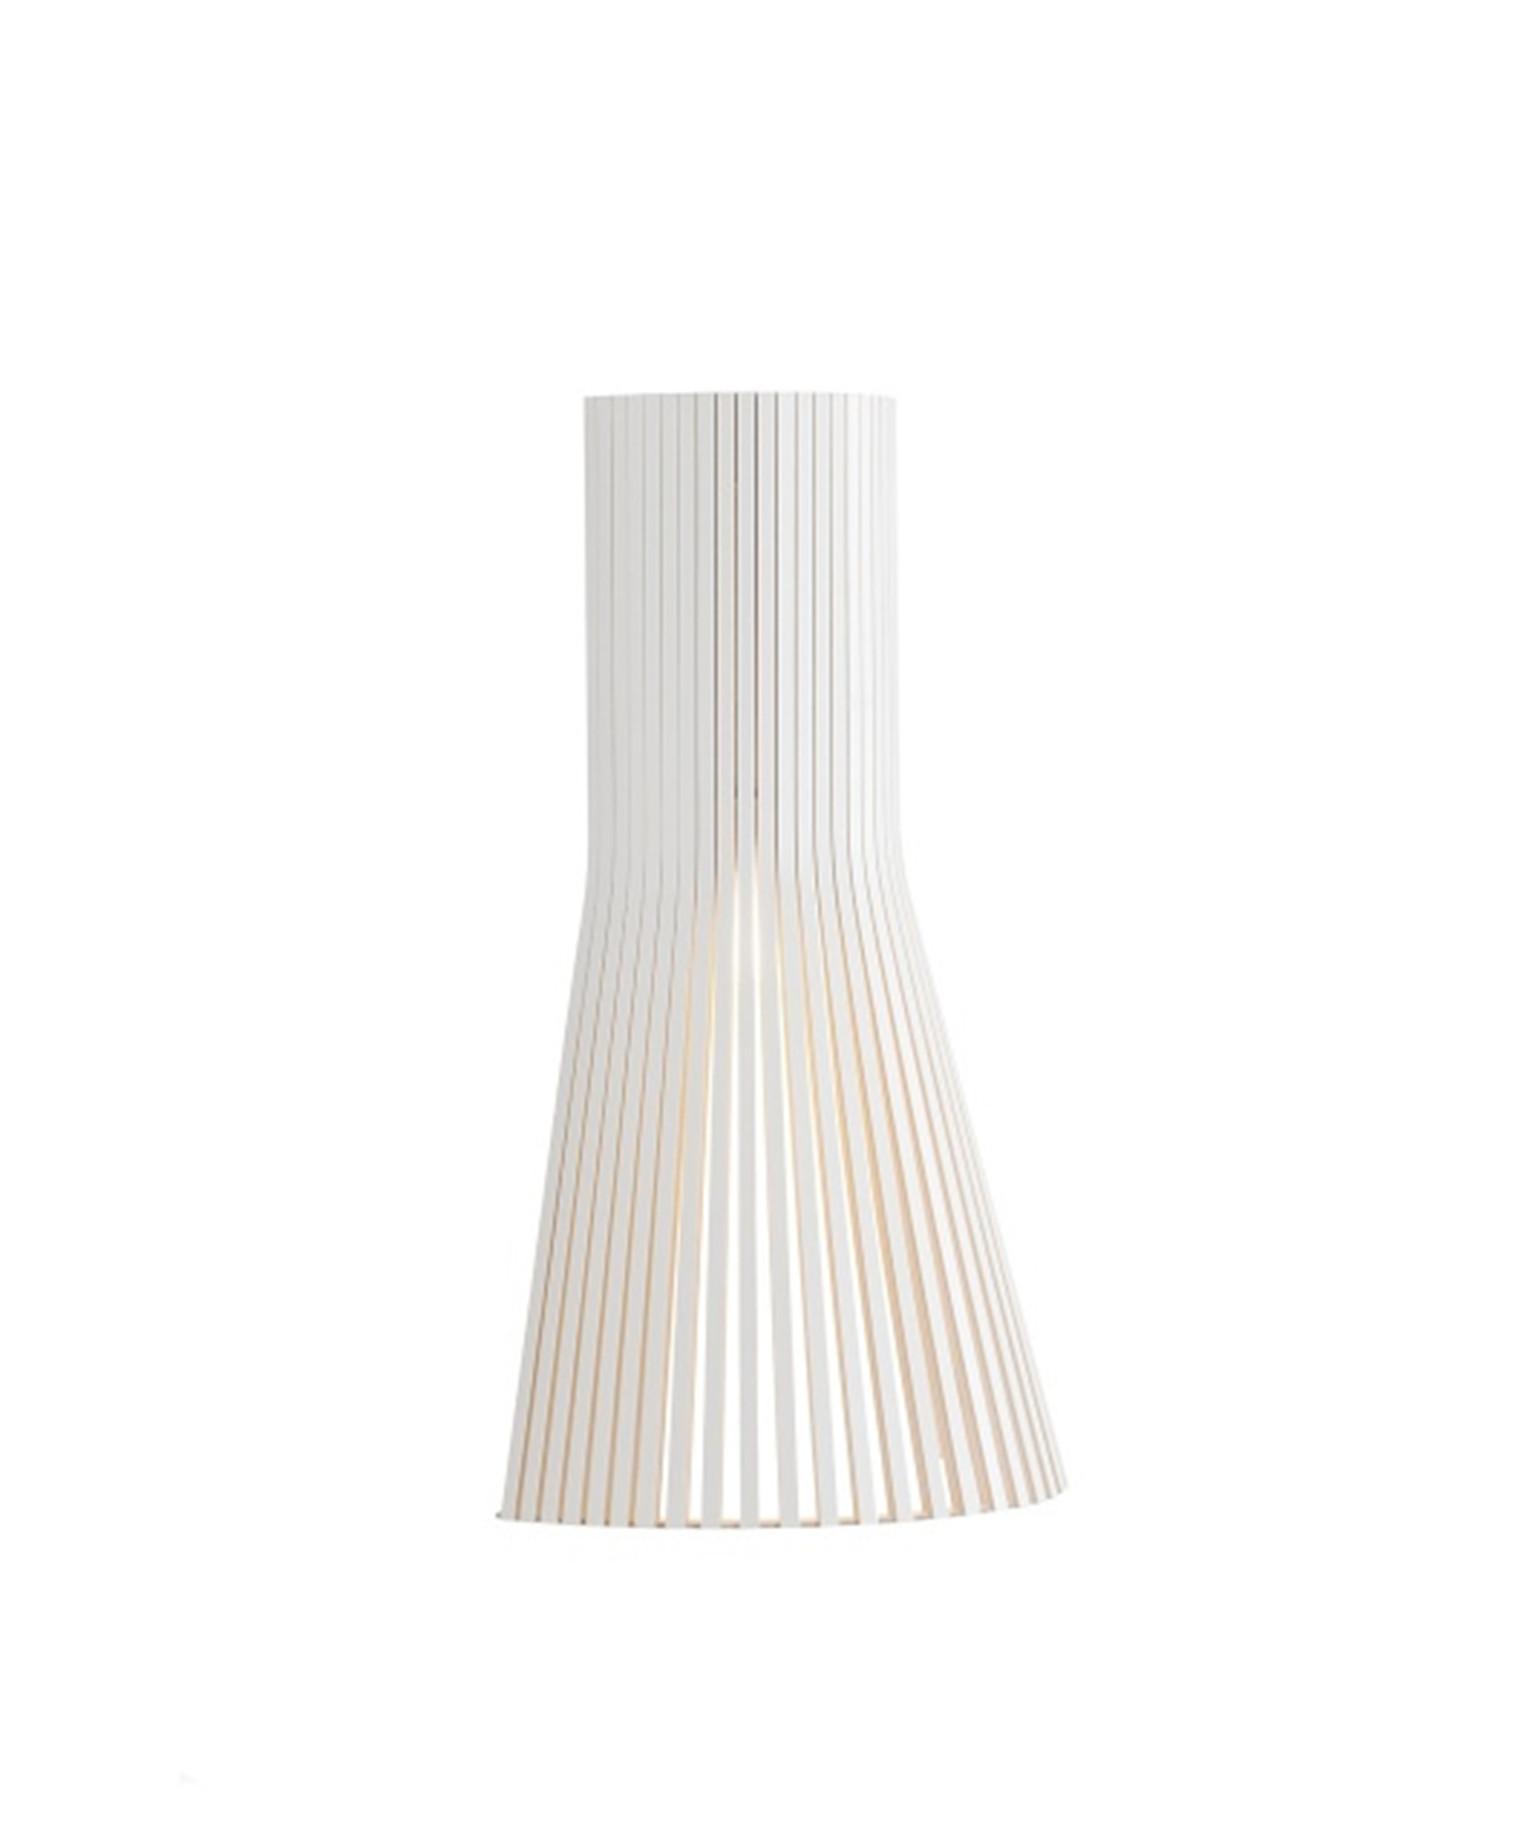 Secto 4231 Væglampe Hvid - Secto thumbnail